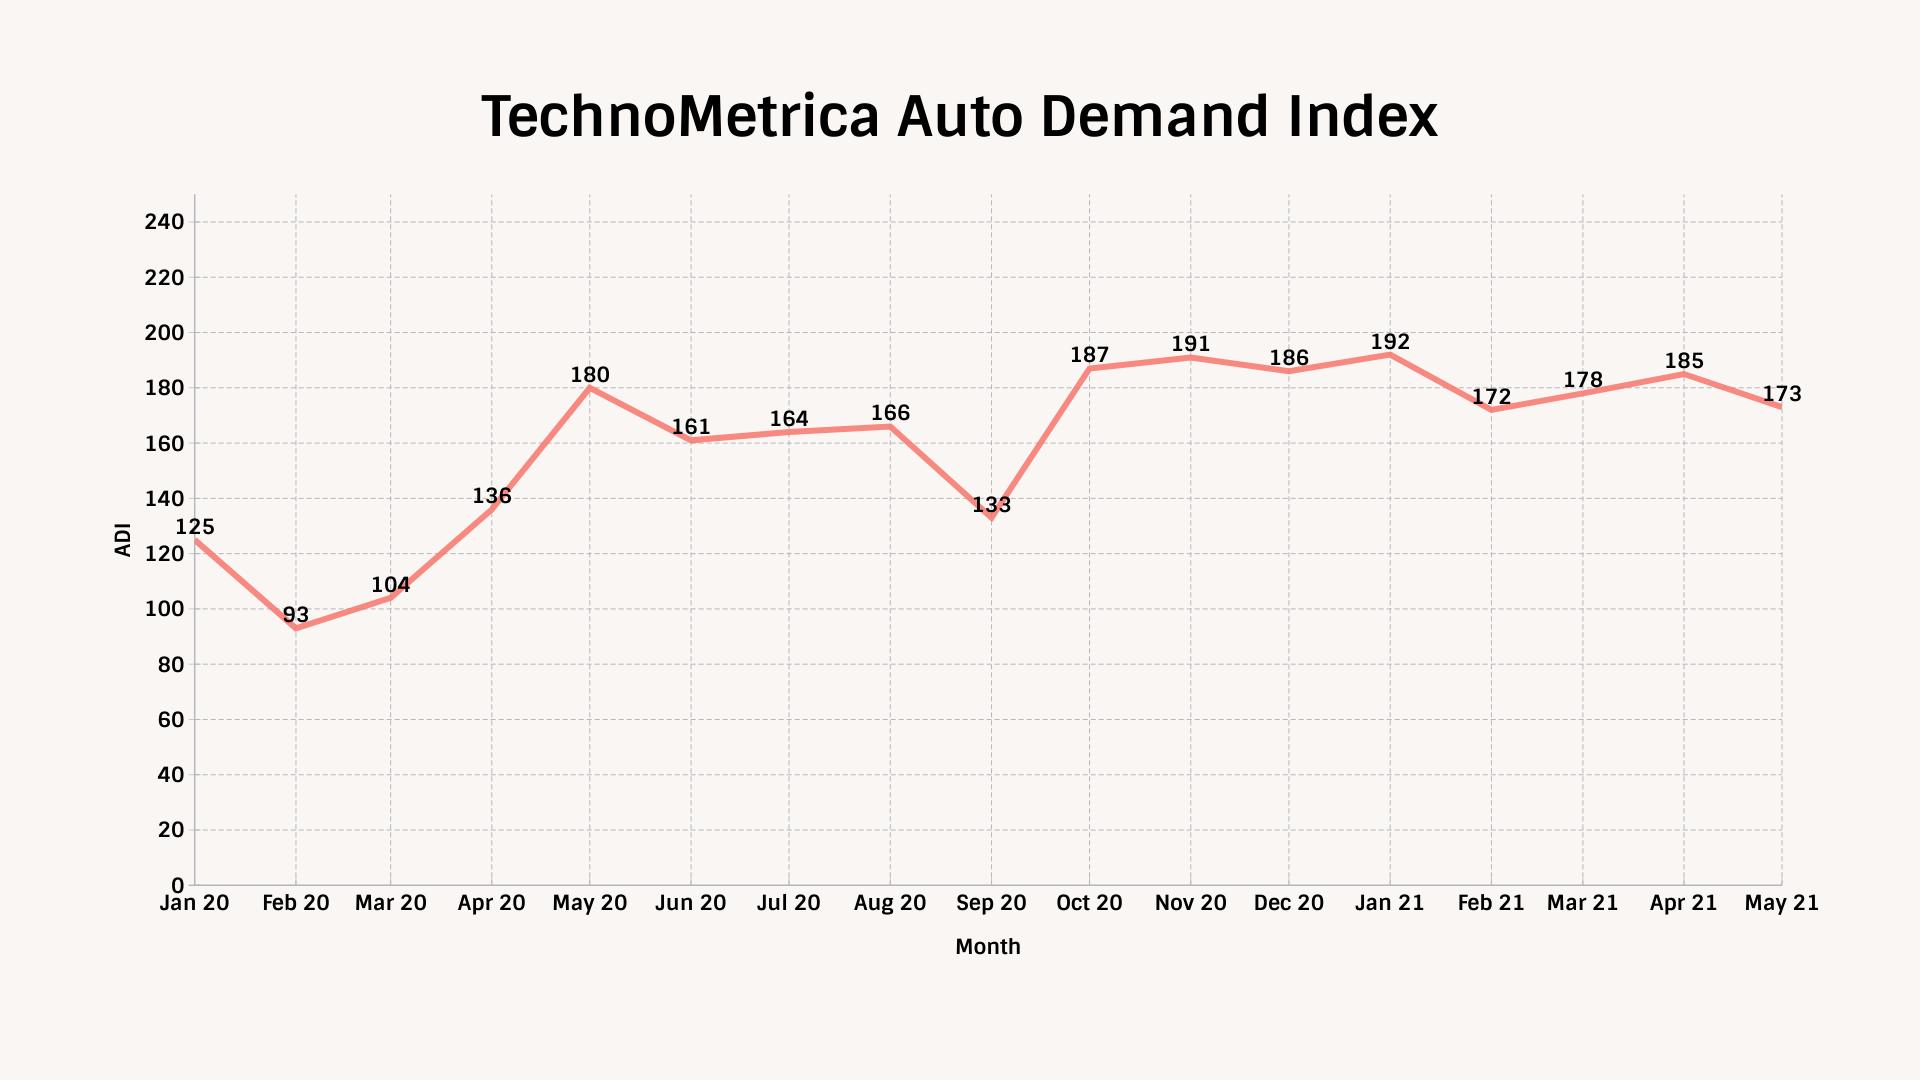 TechnoMetrica Automotive Demand Index Tracking Chart